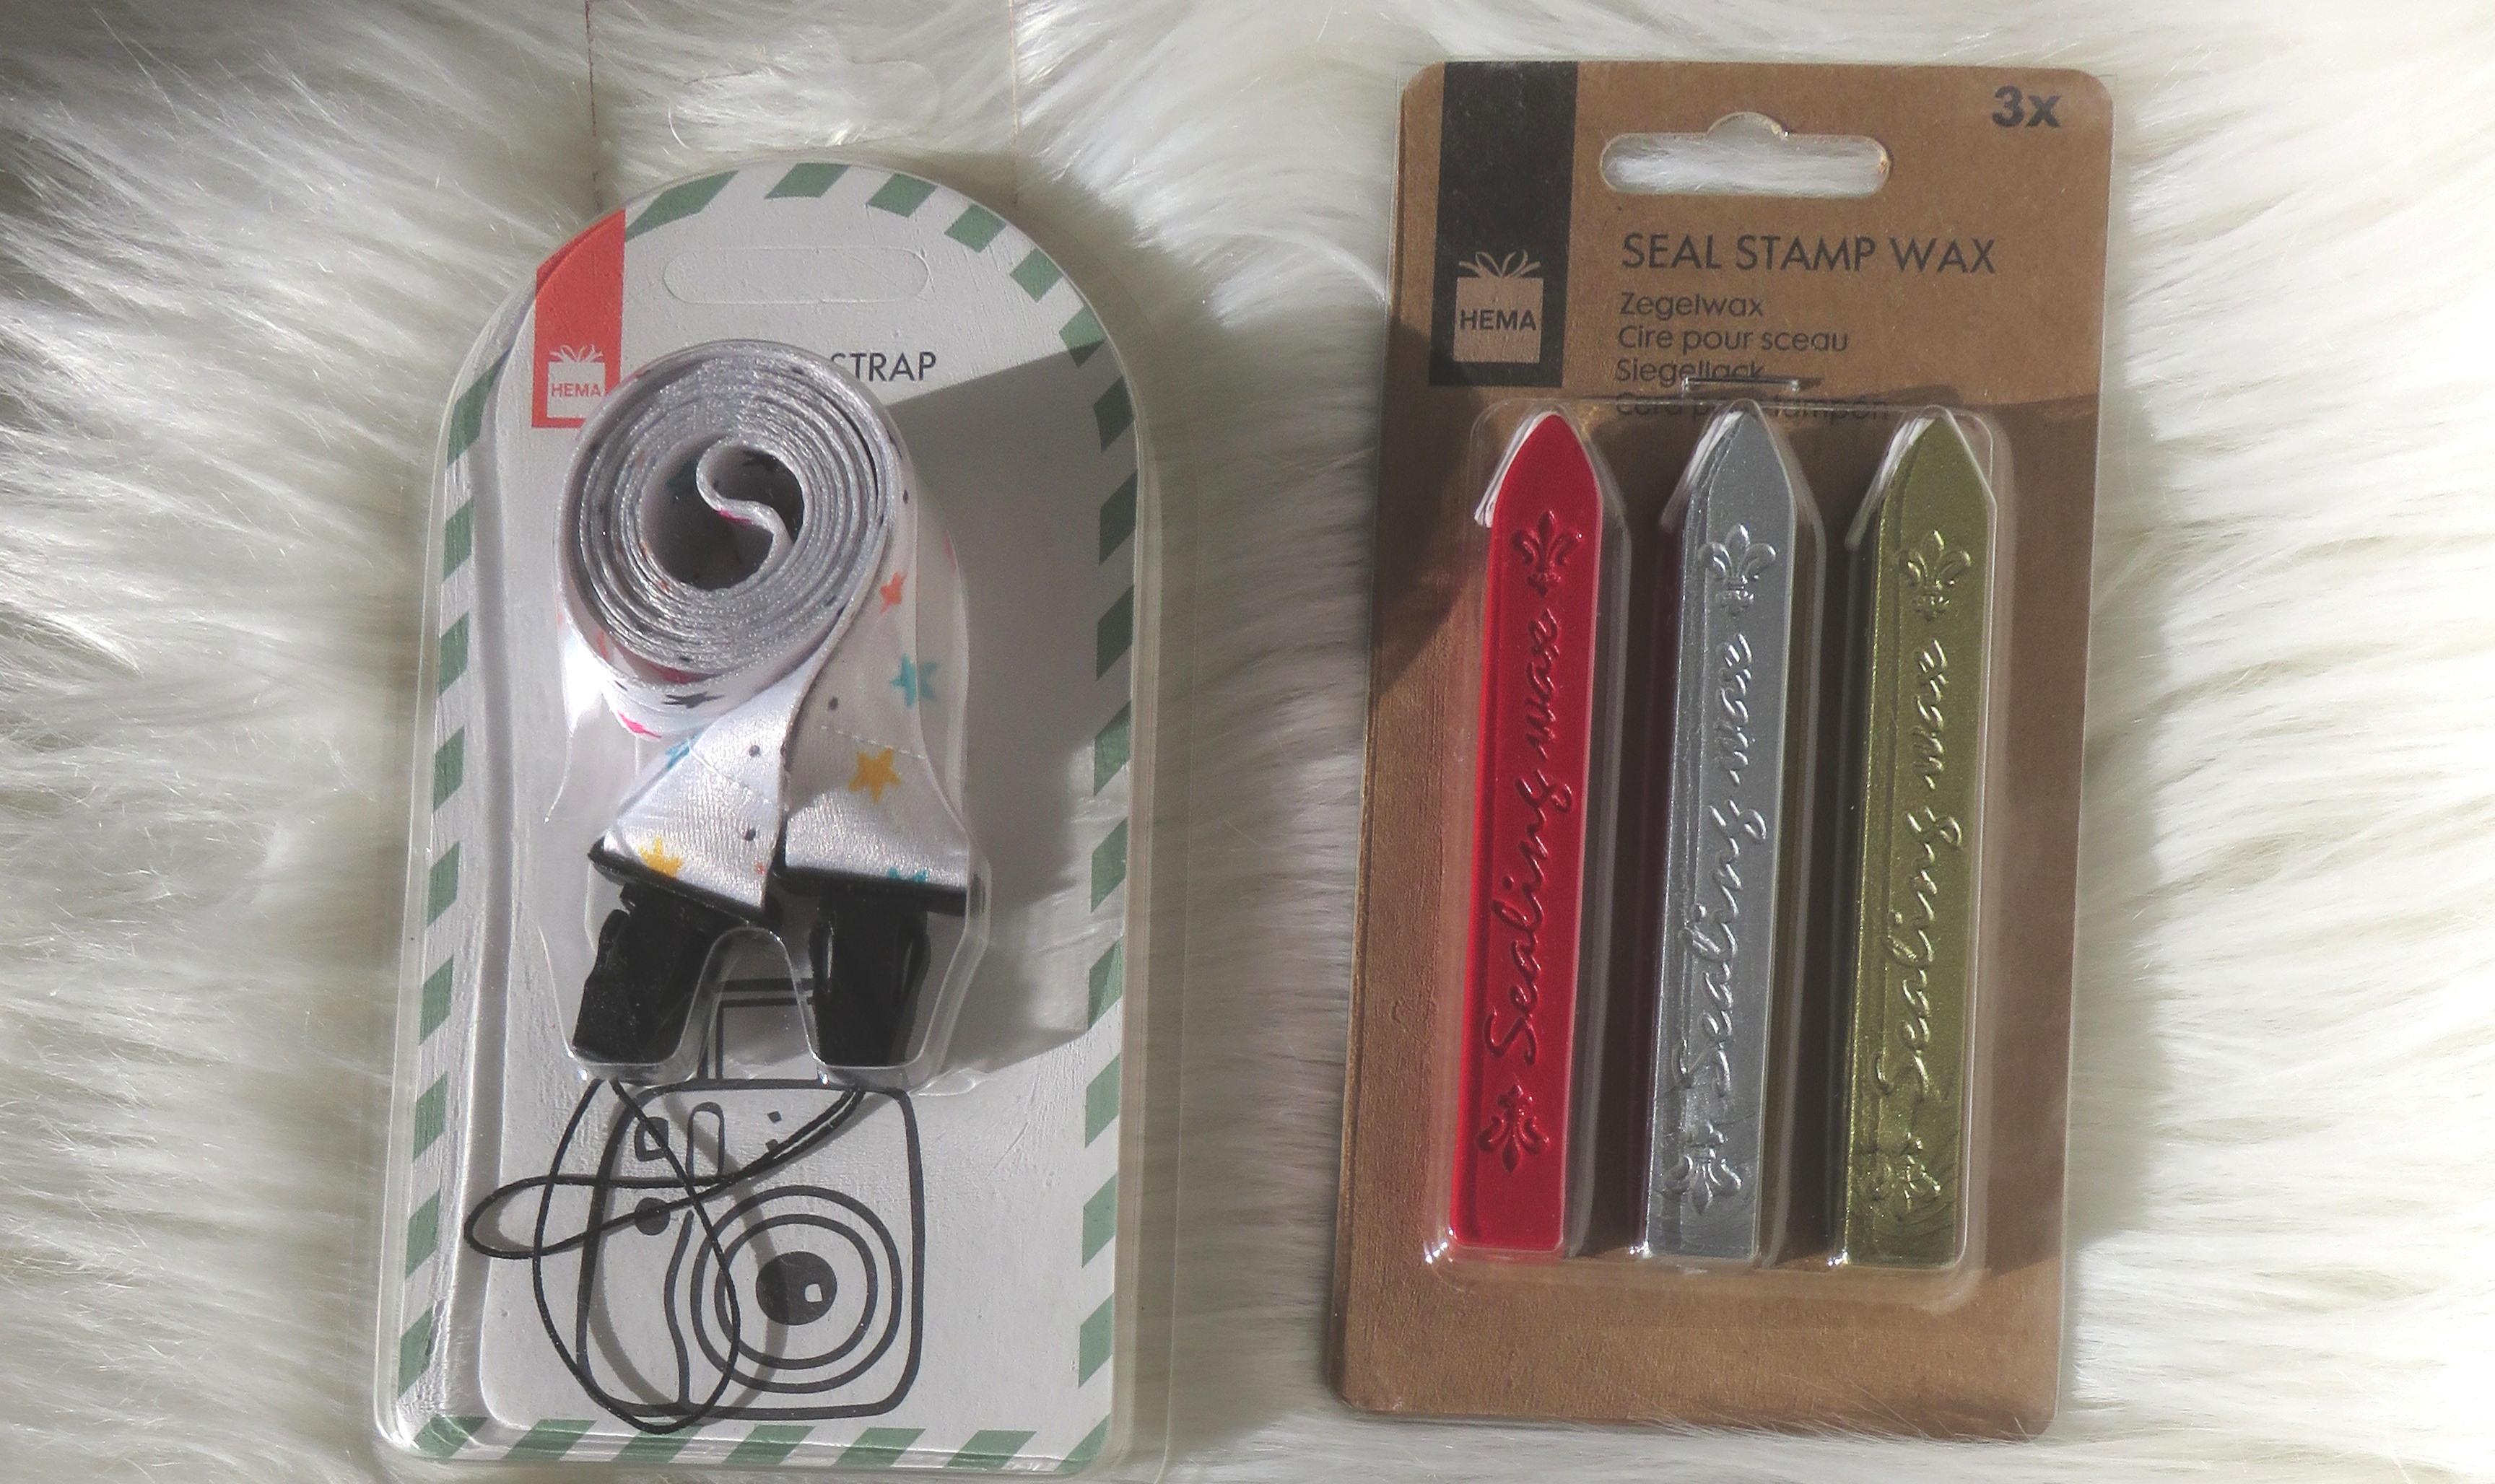 hema Instax camera strap + seal stamp wax